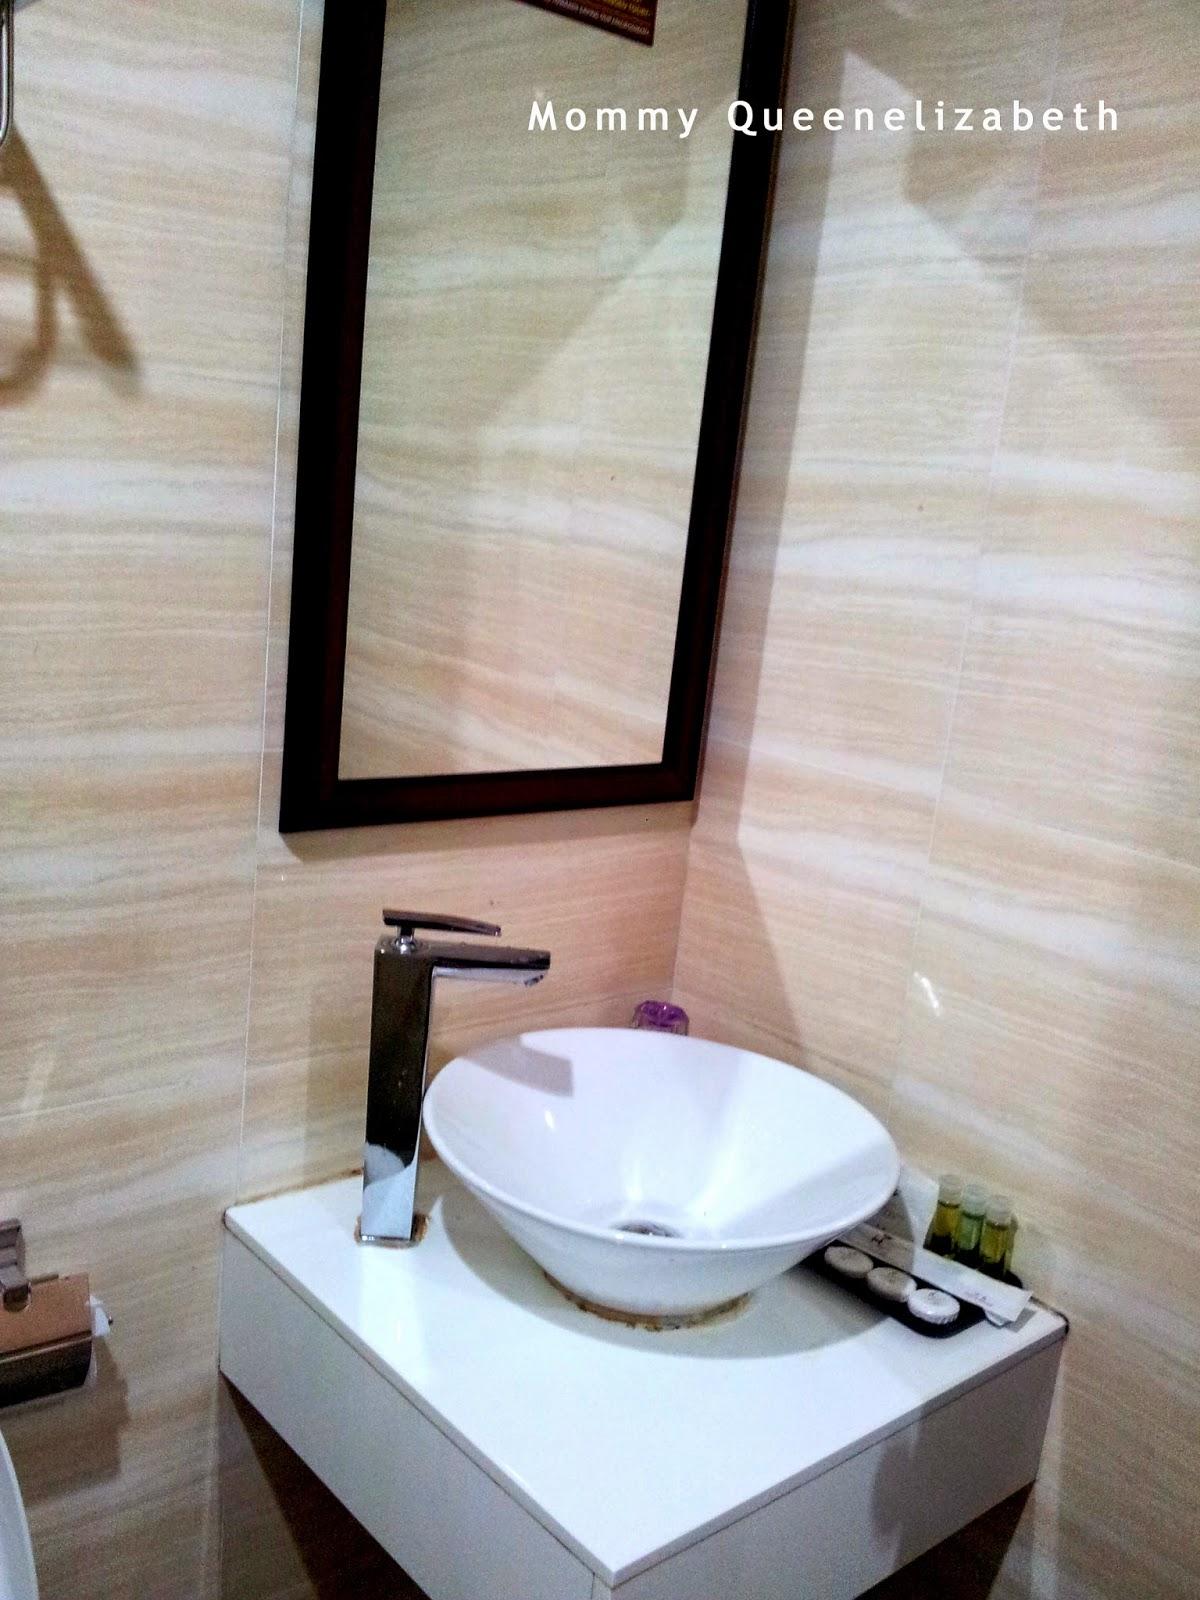 Bathroom Accessories Johor hallmark regency hotel, johor bahru - mommy queenelizabeth